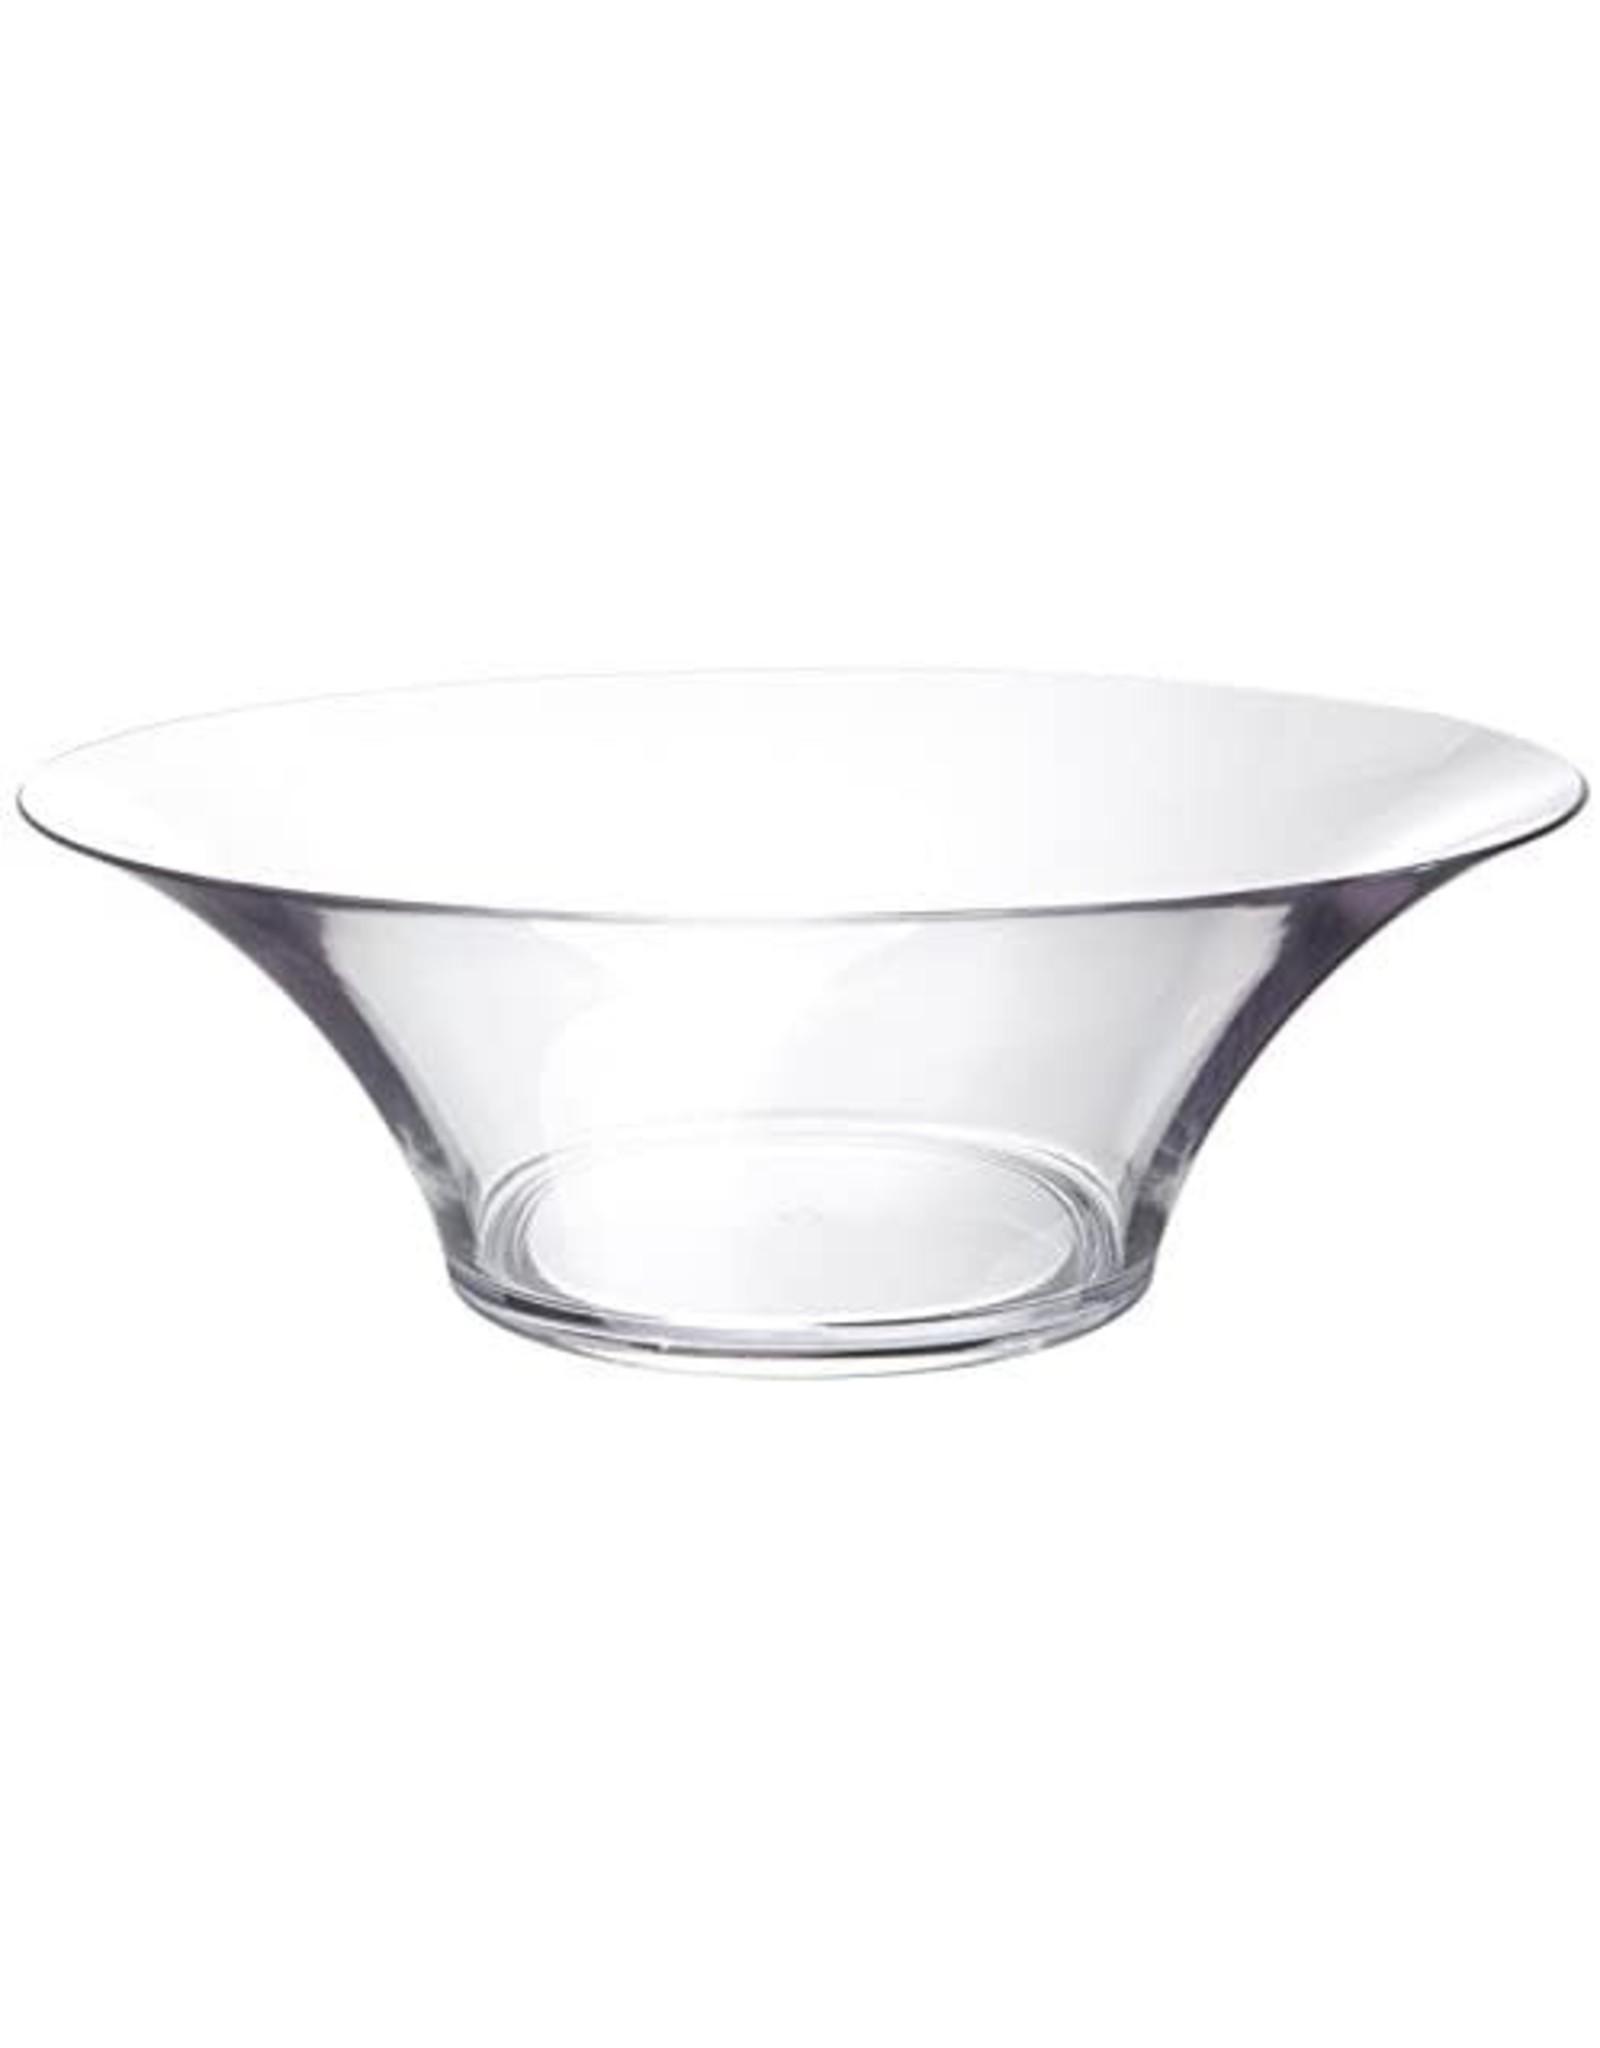 "Click Clack STRAHL 13.5"" Serving Bowl Design+Contemporary"